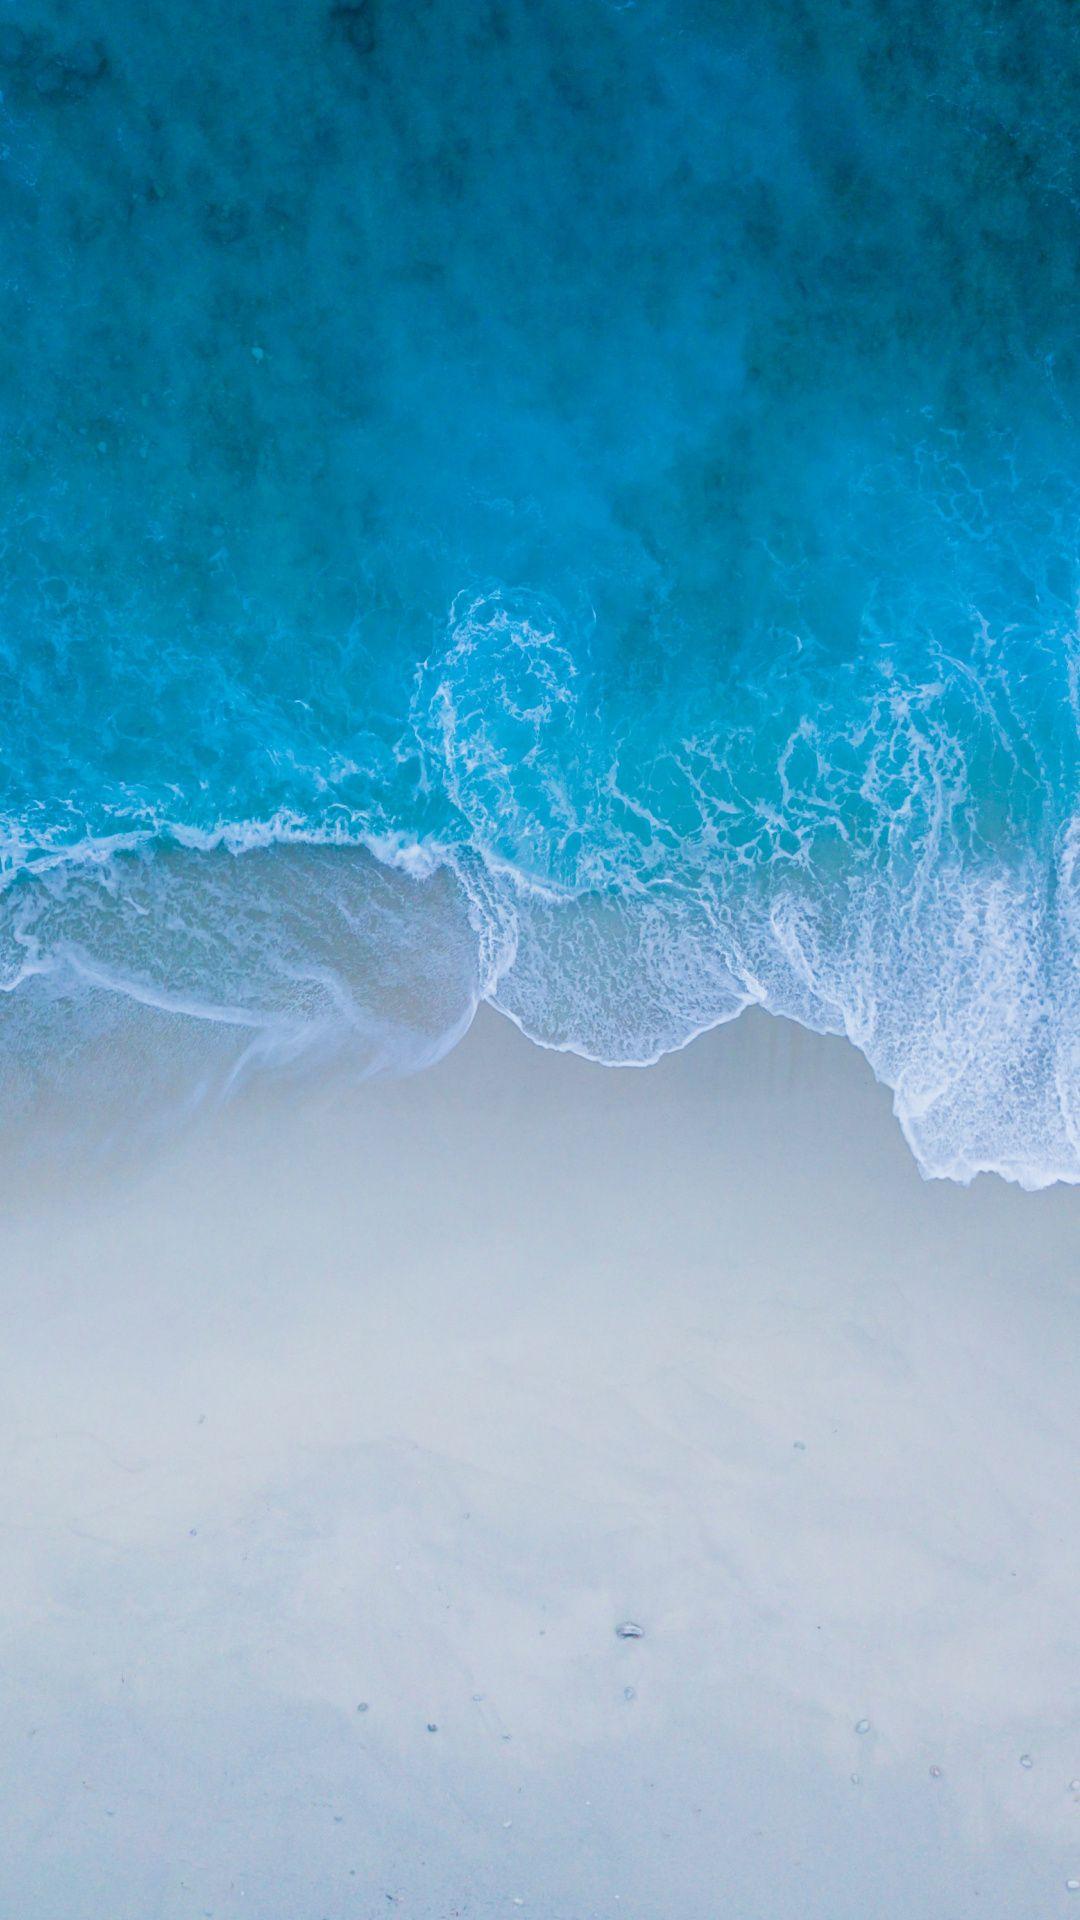 Sea Sea Waves Blue Aerial View Nature Wallpaper Nature Wallpaper Blue Water Wallpaper Waves Wallpaper